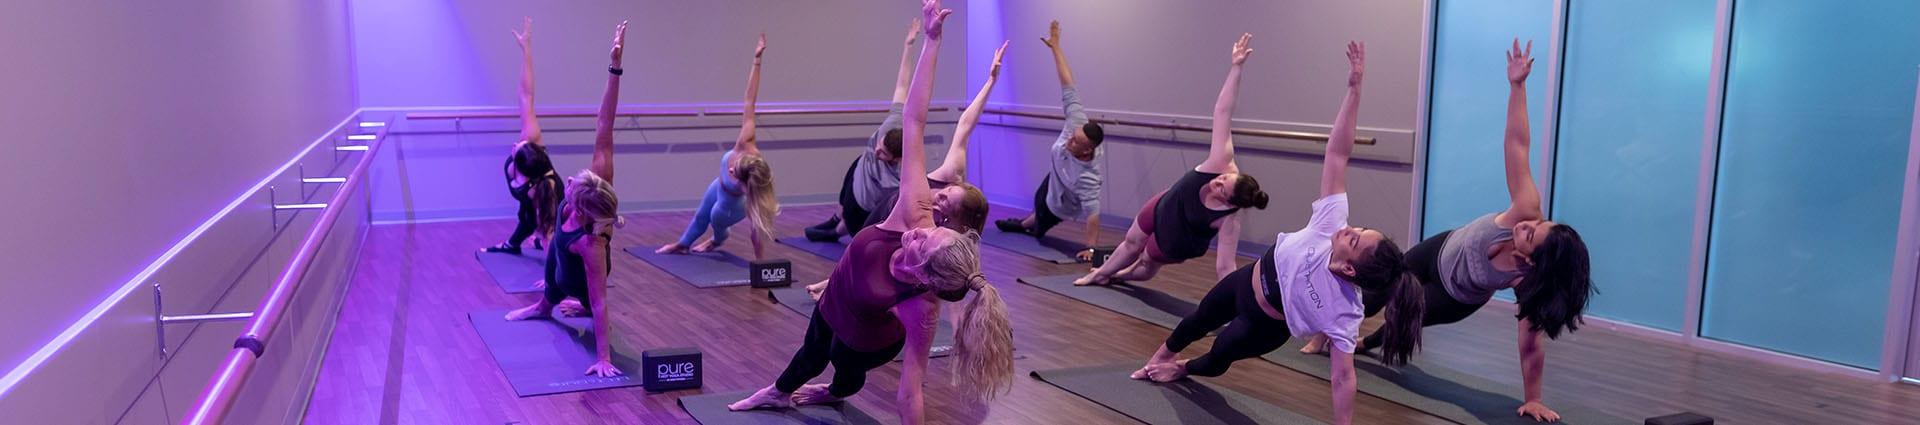 group class doing pilates